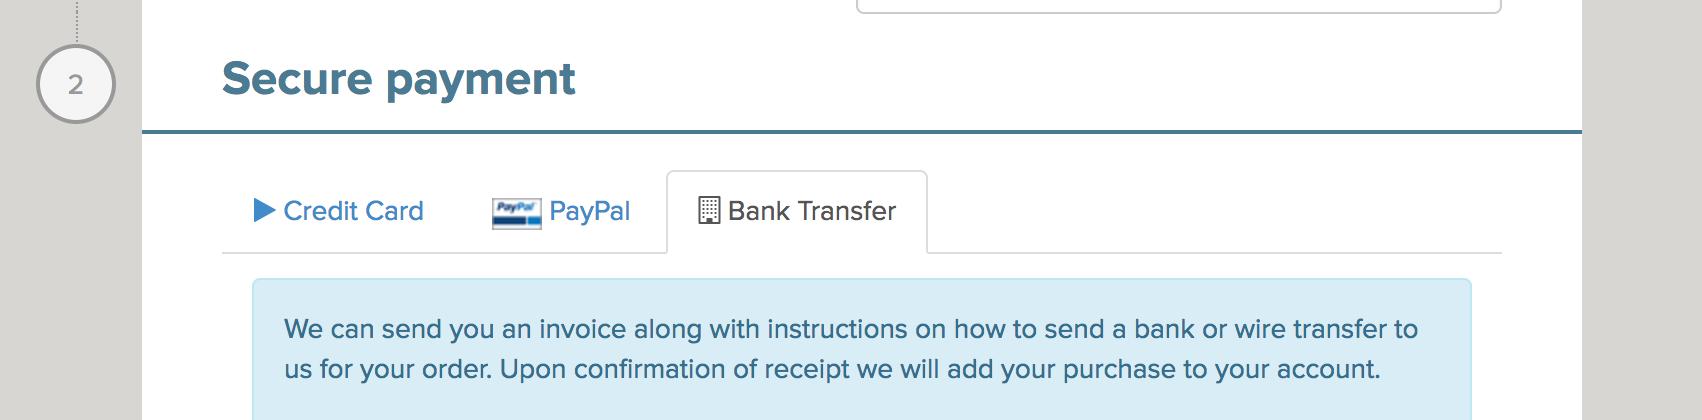 Bank Transfer Payment Method